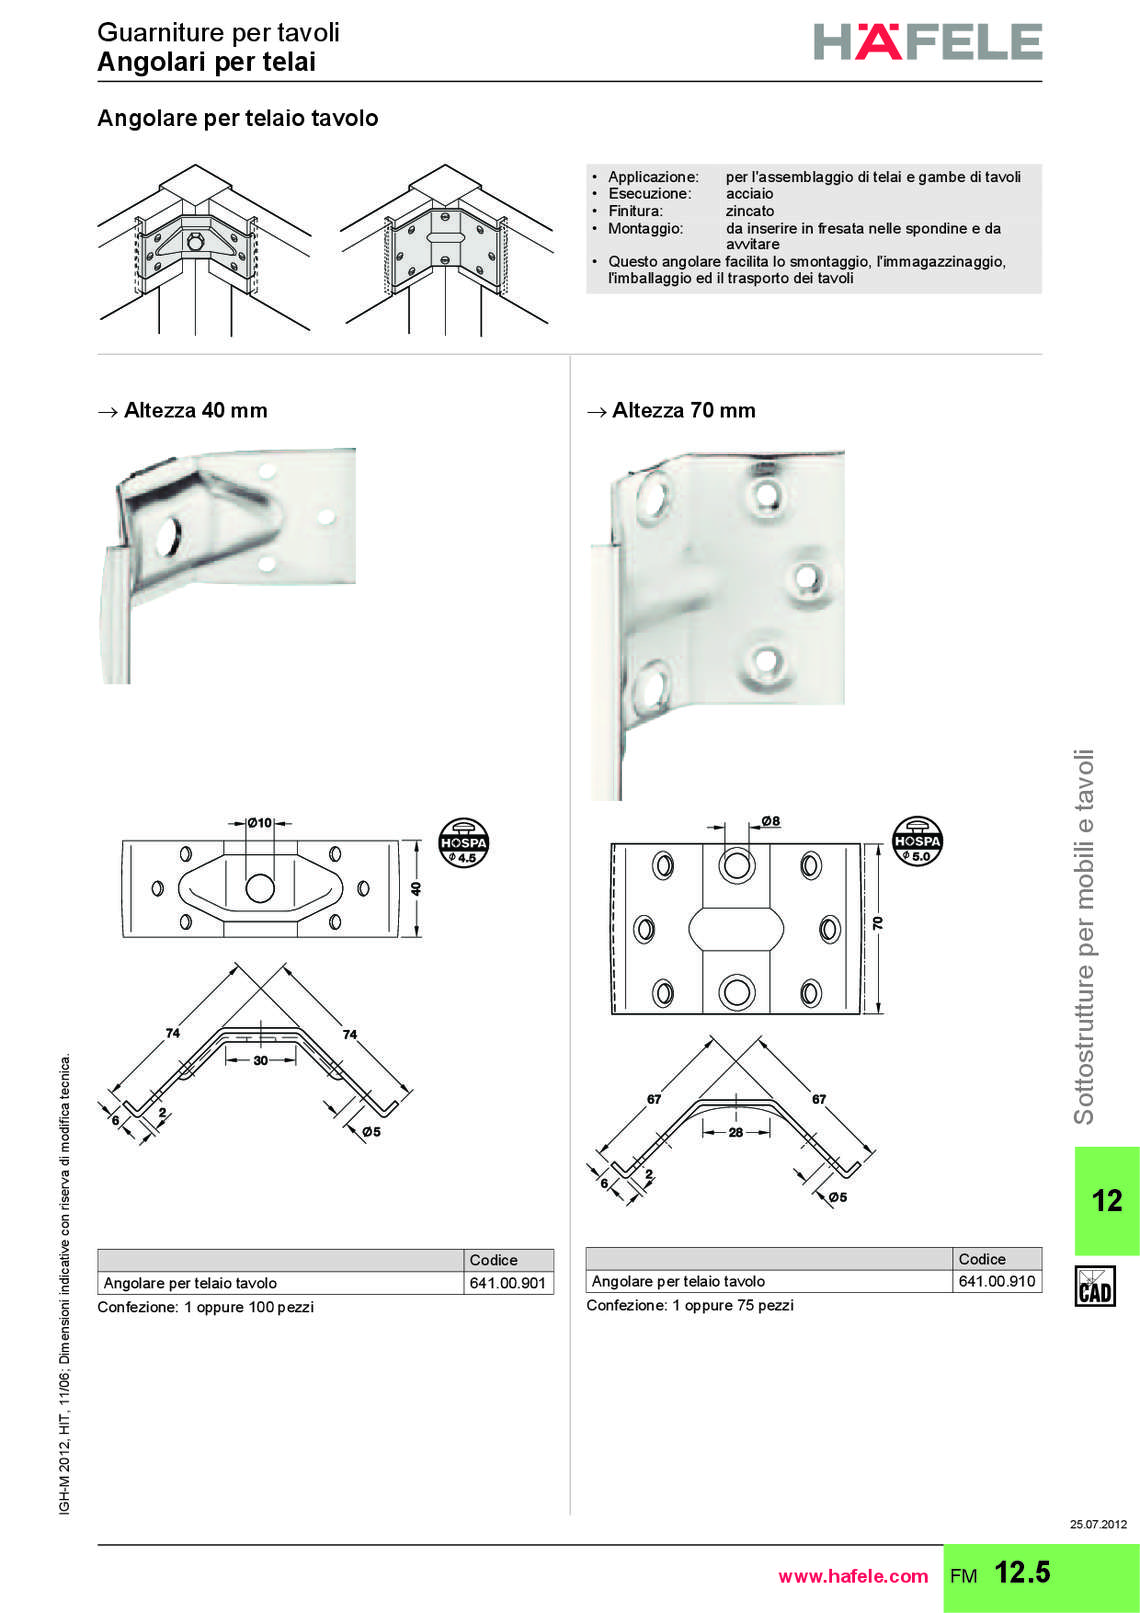 hafele-sottostrutture-per-mobili_83_014.jpg